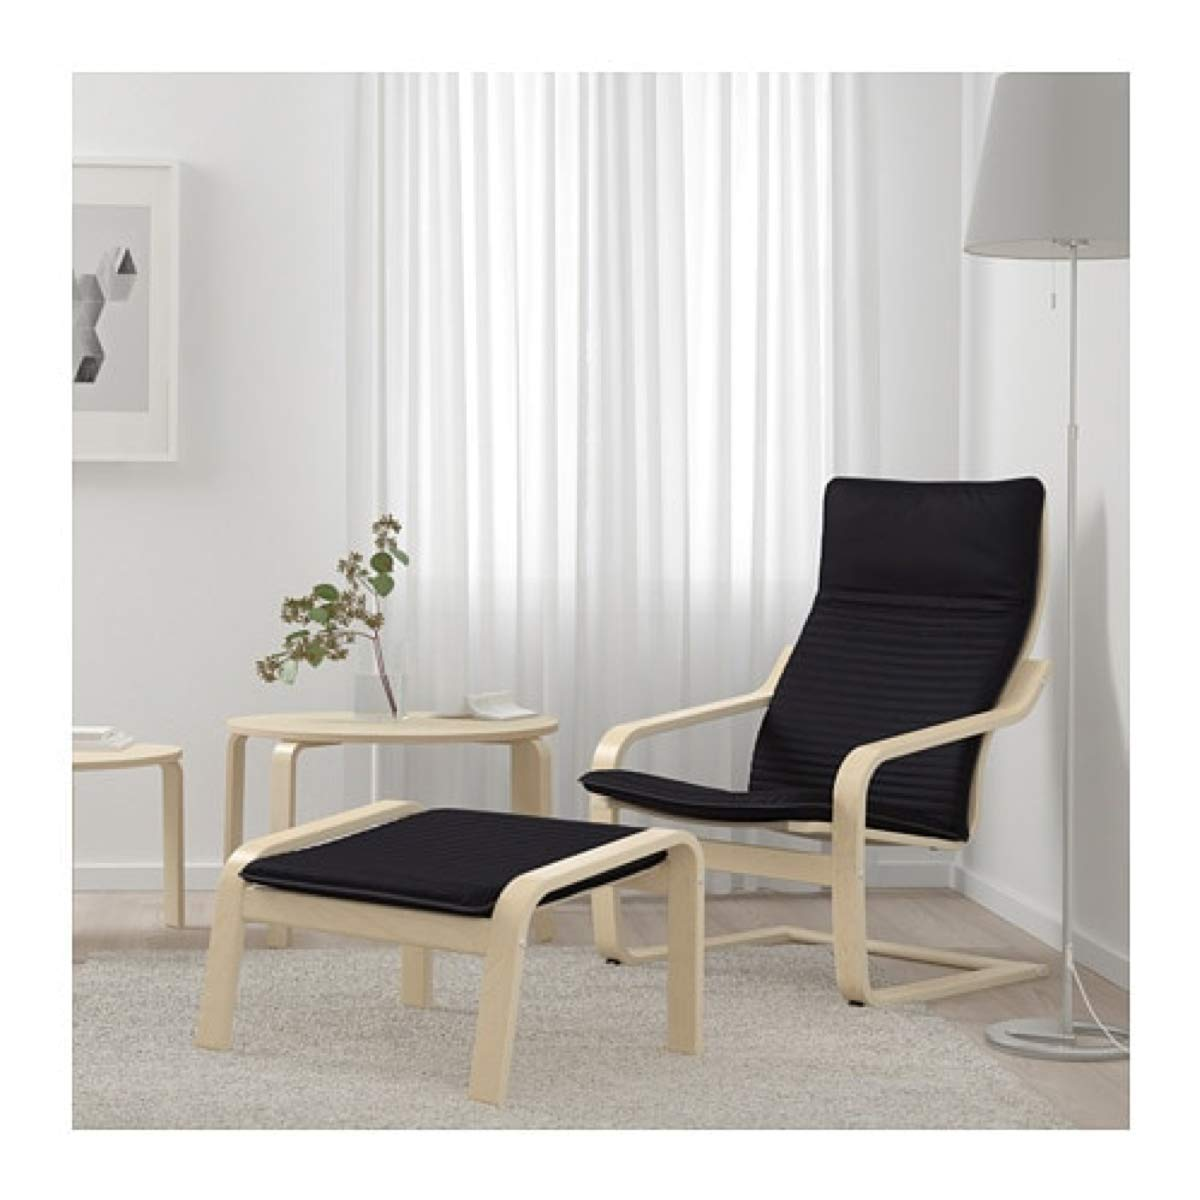 Amazon.com: IKEA 892.446.60 - Jardinera otomana para pájaros ...